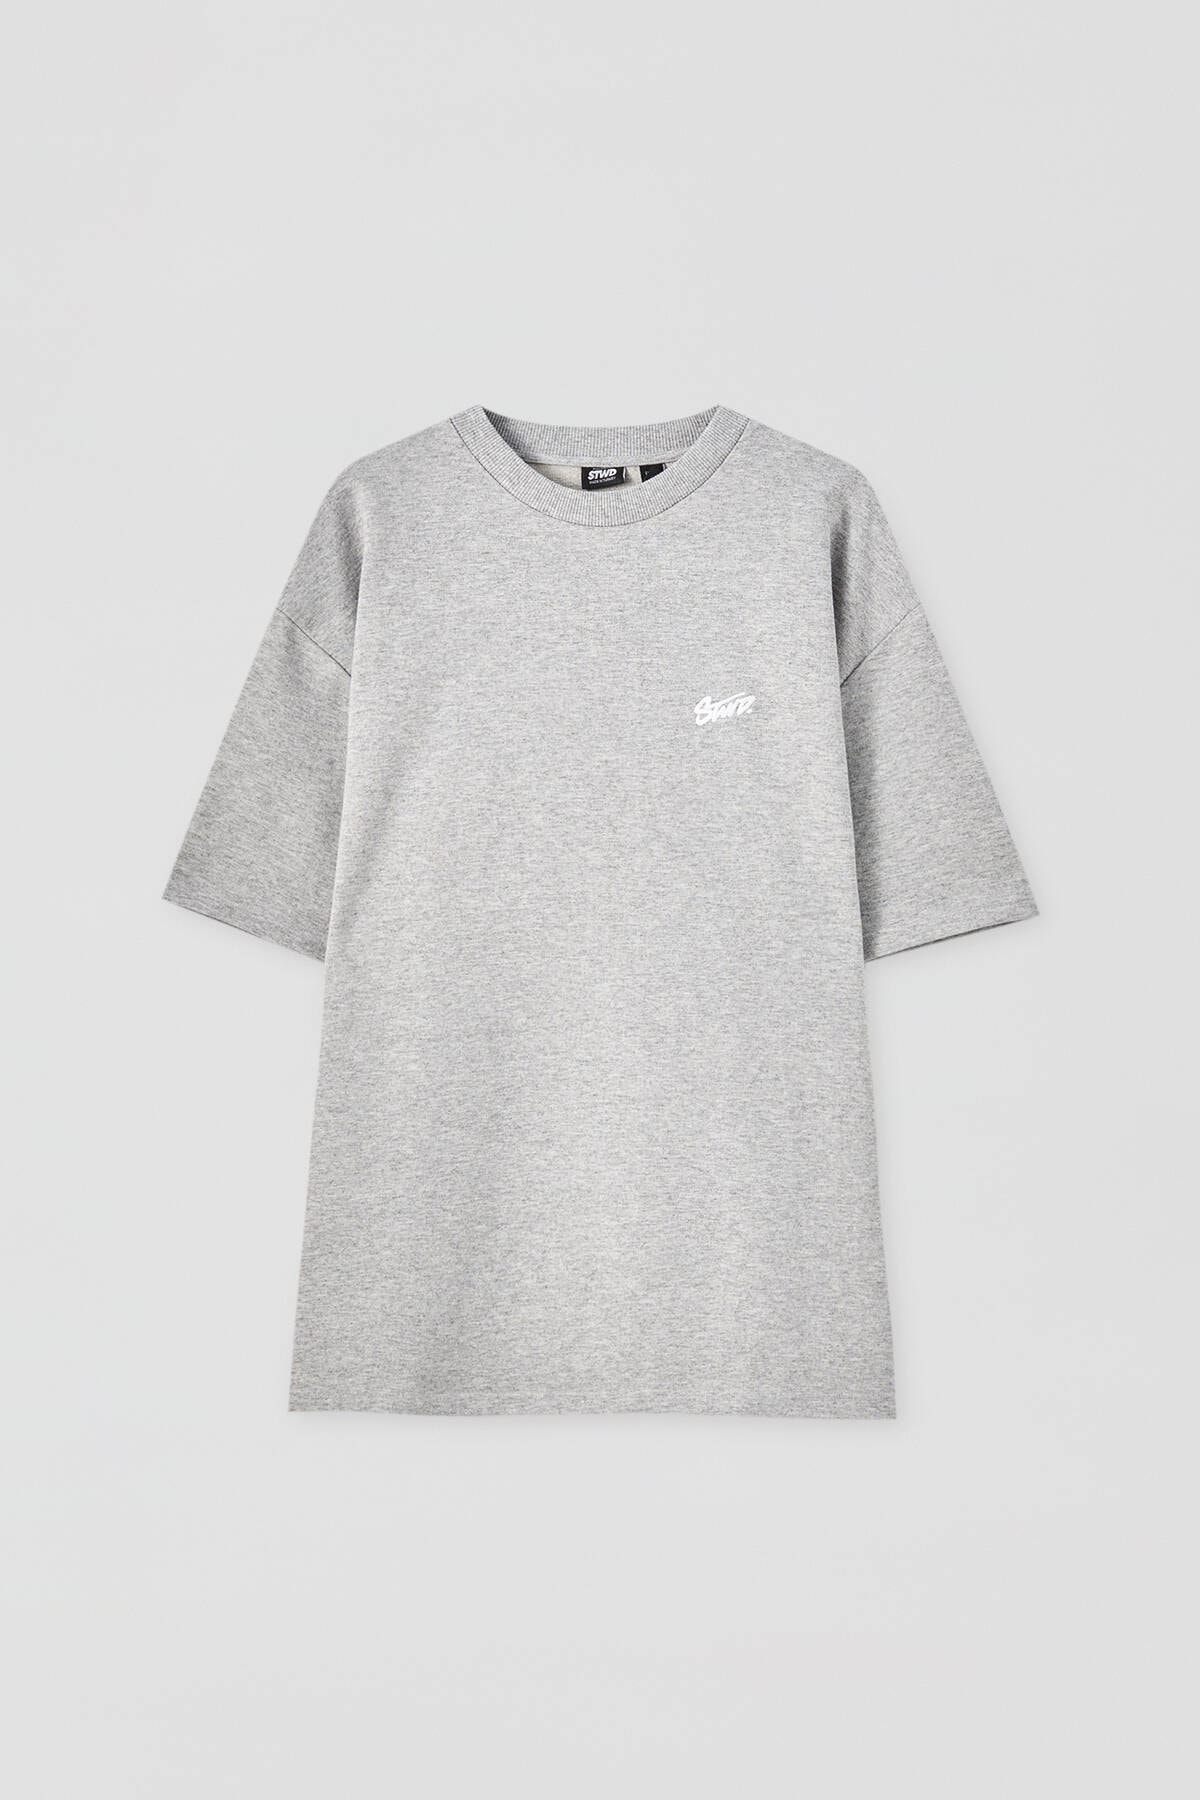 Pull & Bear Erkek Açık Gri Homewear Kapsül Koleksiyonu T-Shirt 04240542 4